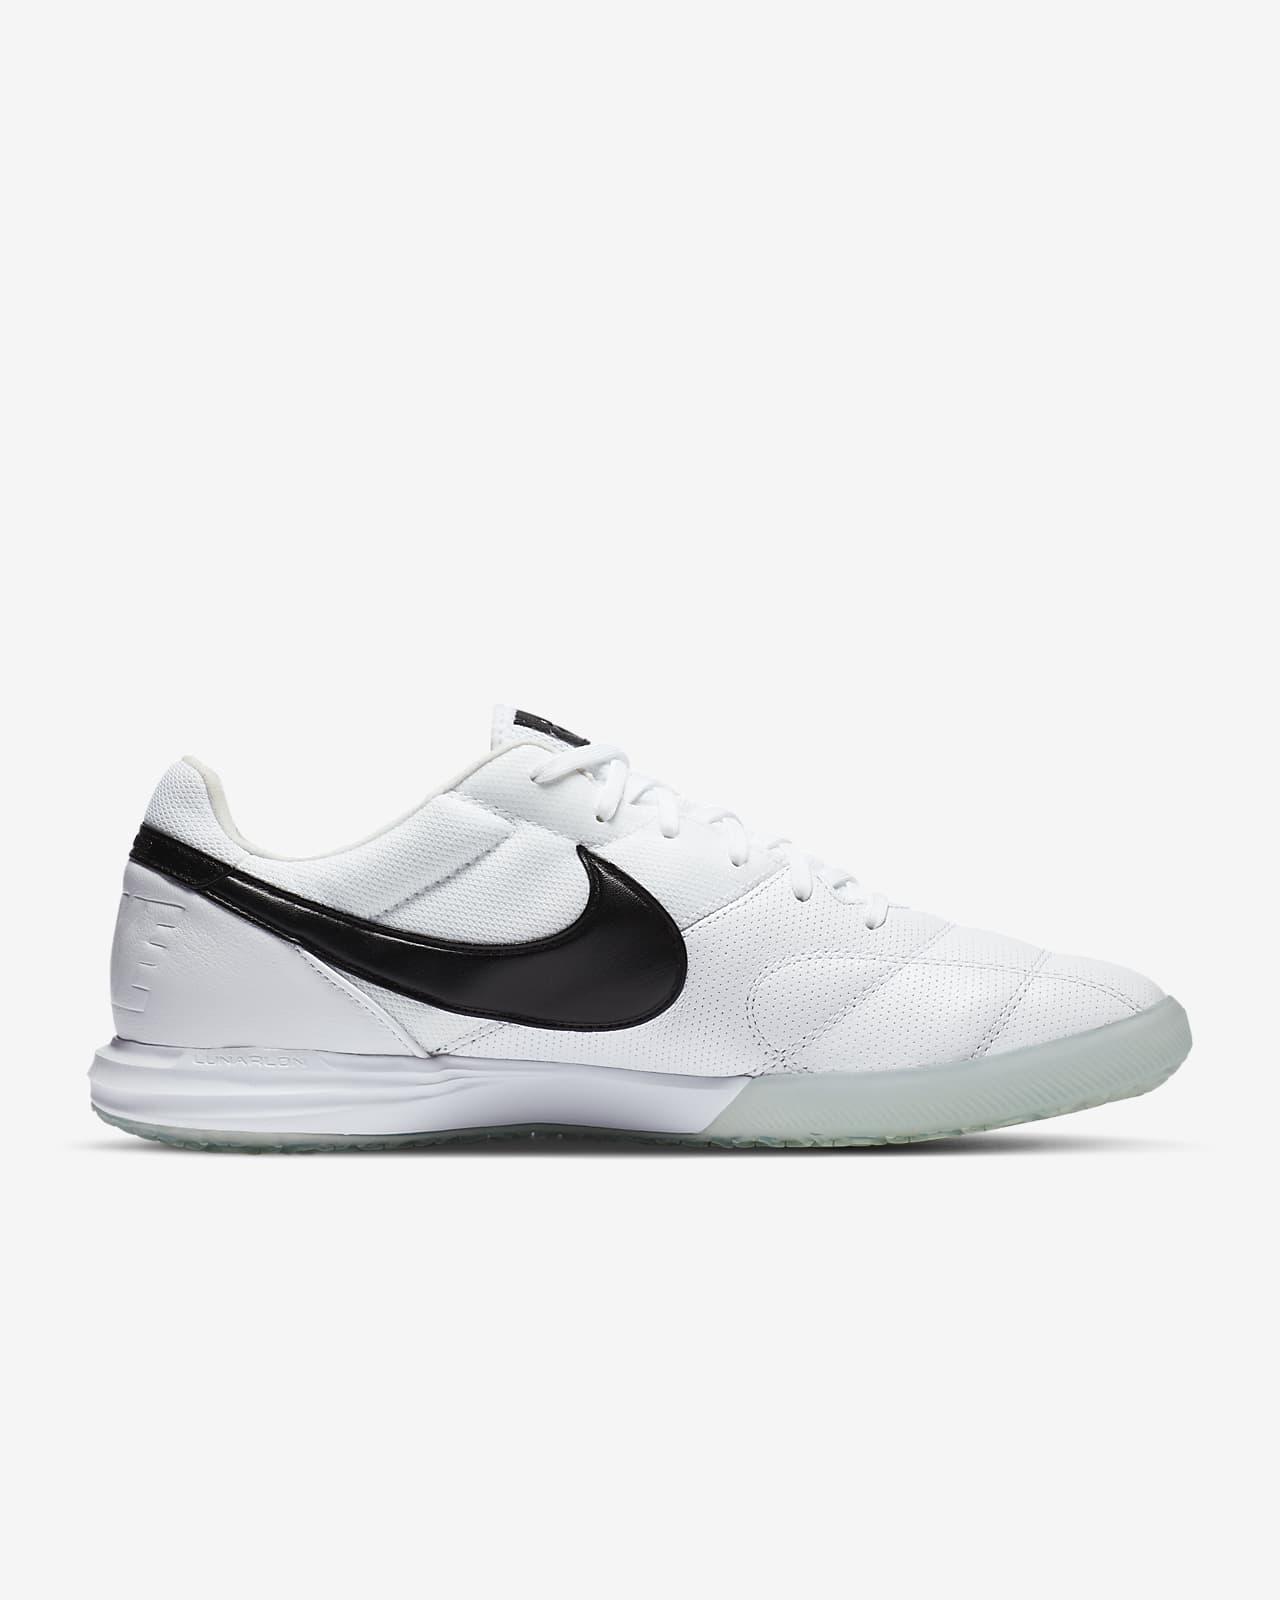 Nike Premier 2 Sala IC Indoor/Court